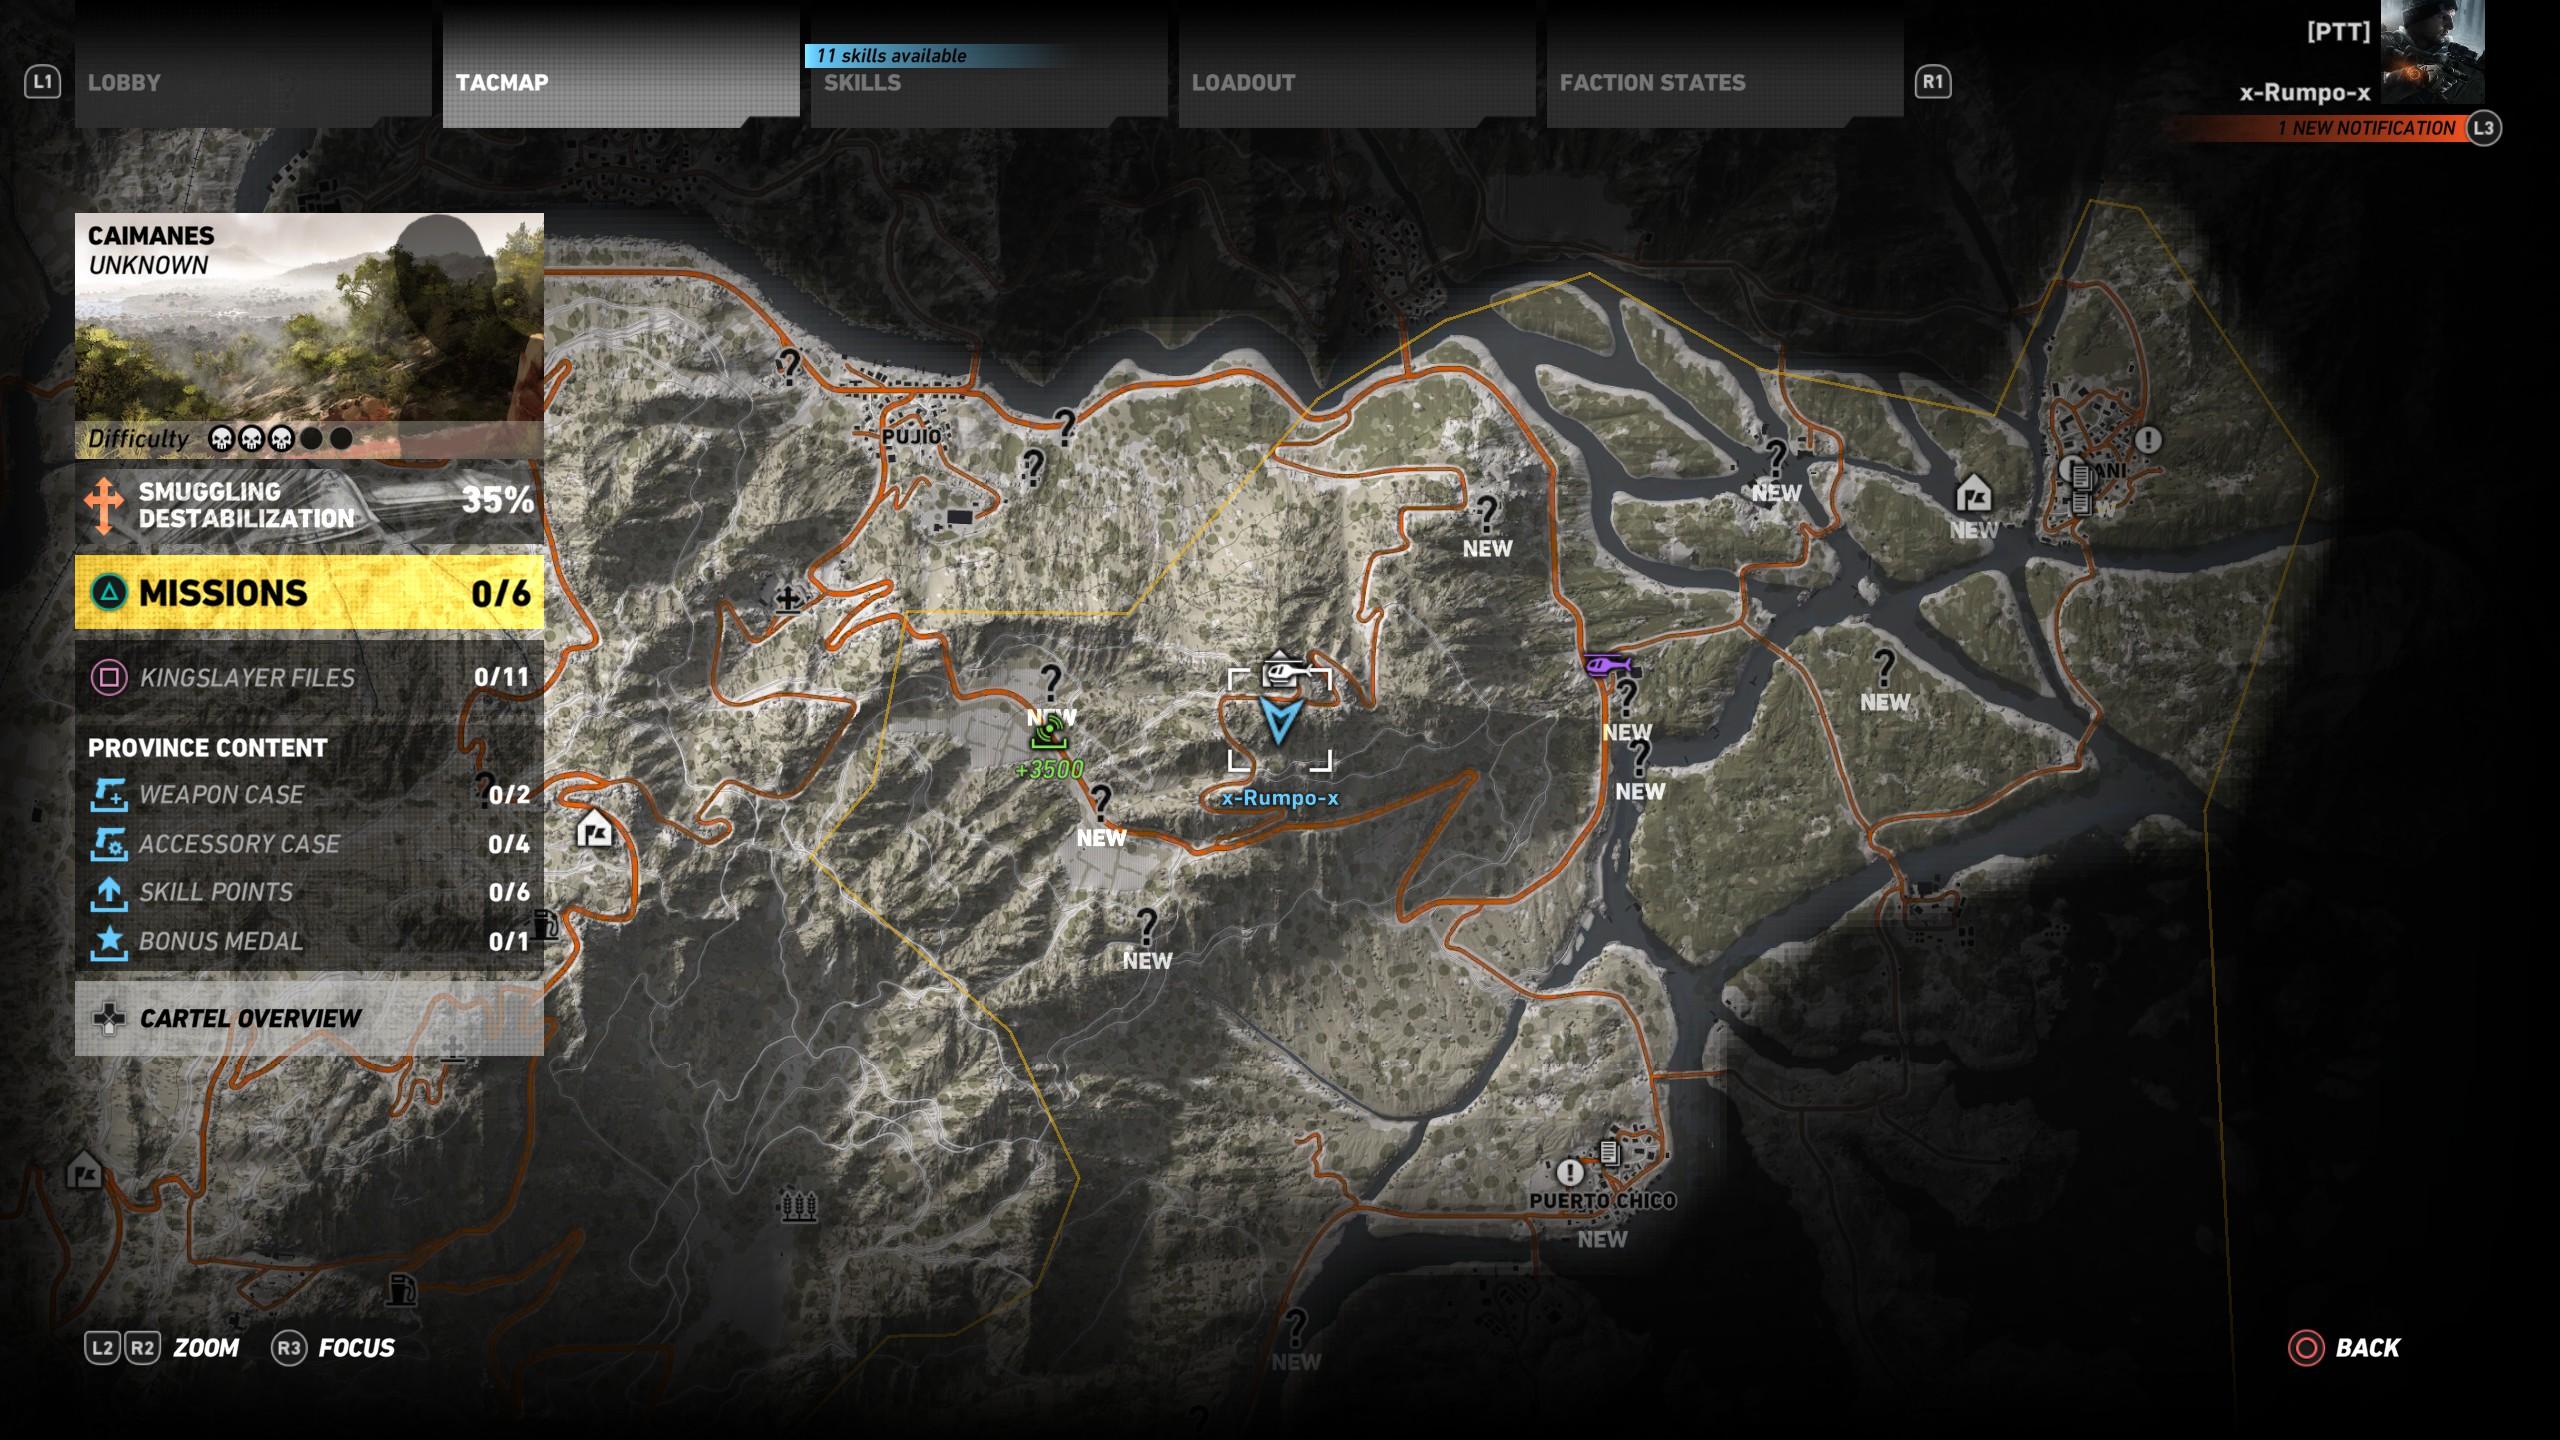 Dark Souls easter egg location in Ghost Recon Wildlands